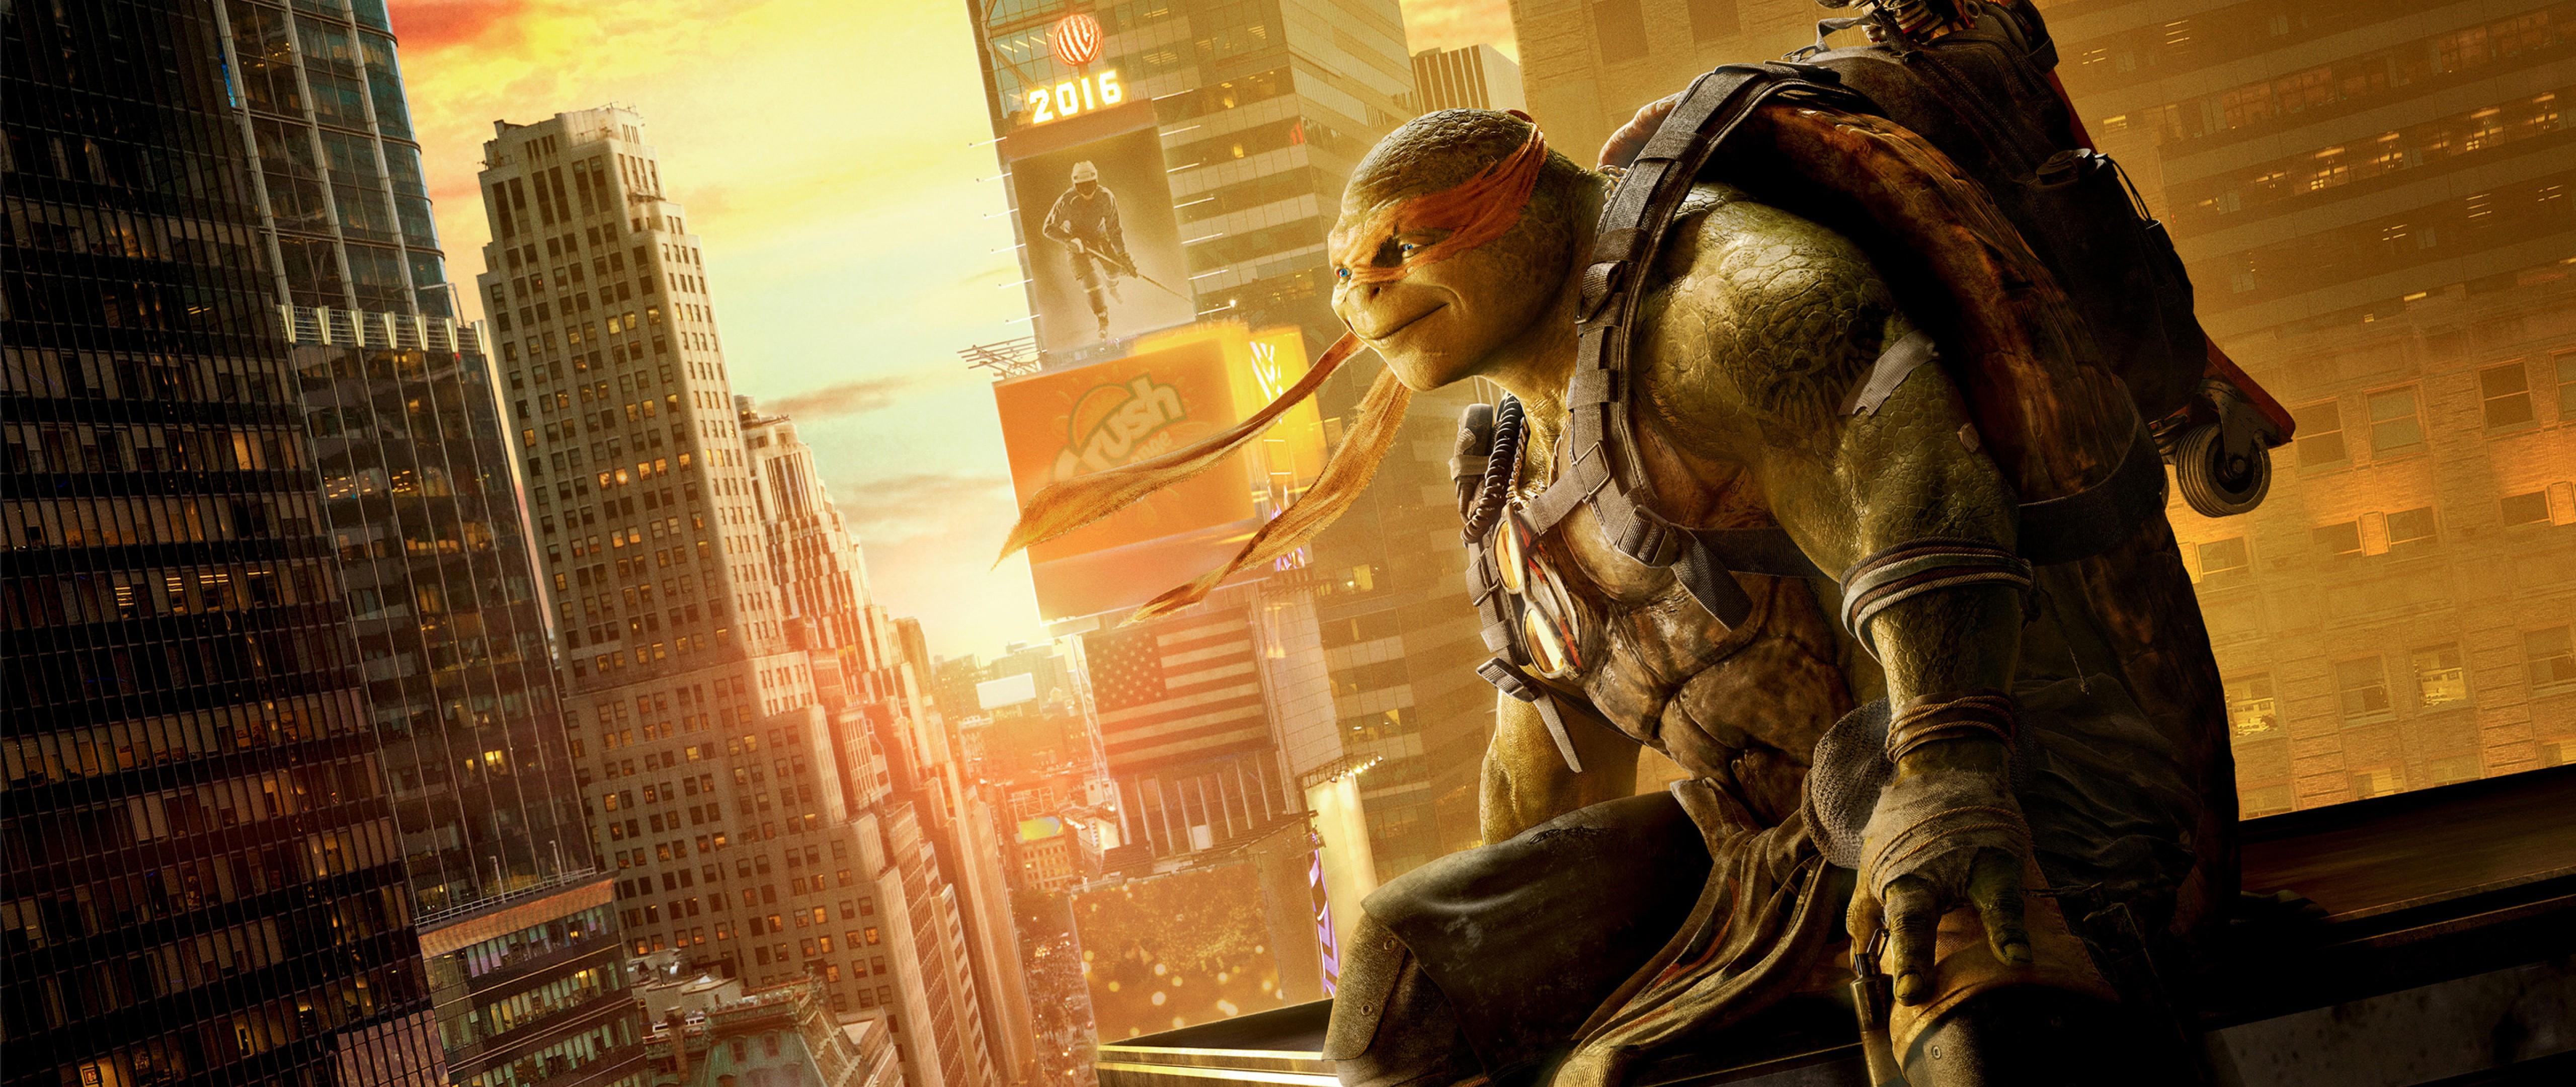 Michelangelo Teenage Mutant Ninja Turtles Hd Wallpaper For Desktop